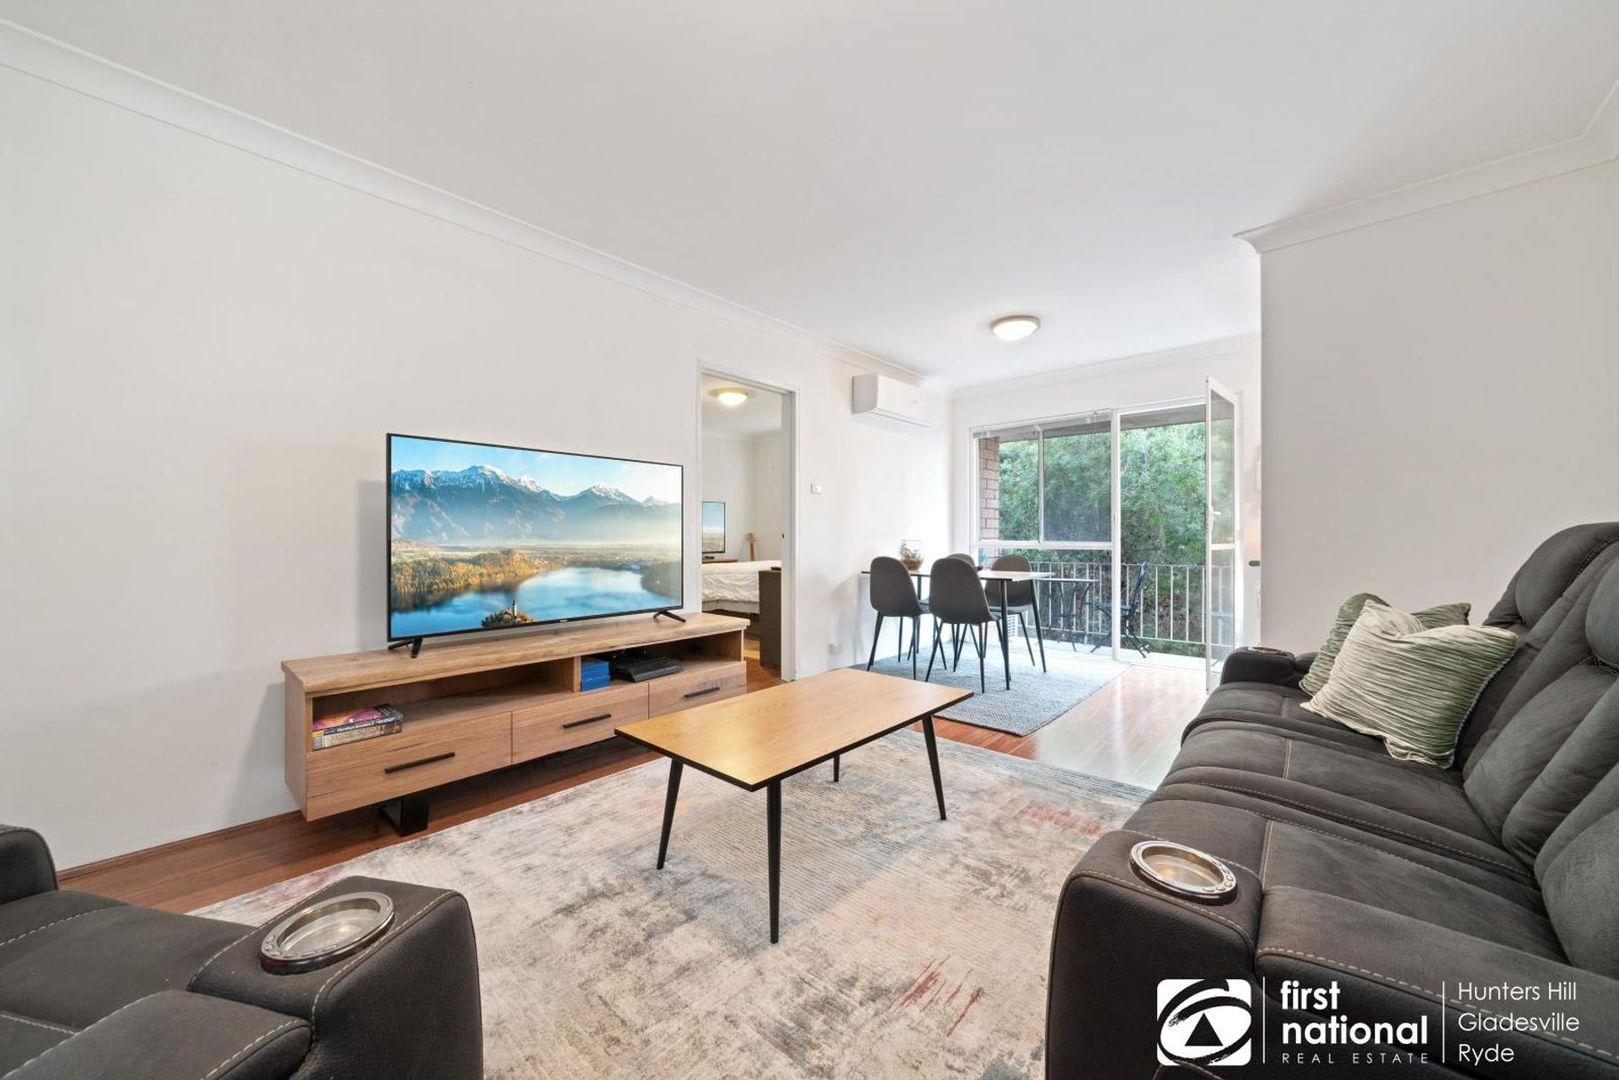 17/21 Pearson Street, Gladesville NSW 2111, Image 0